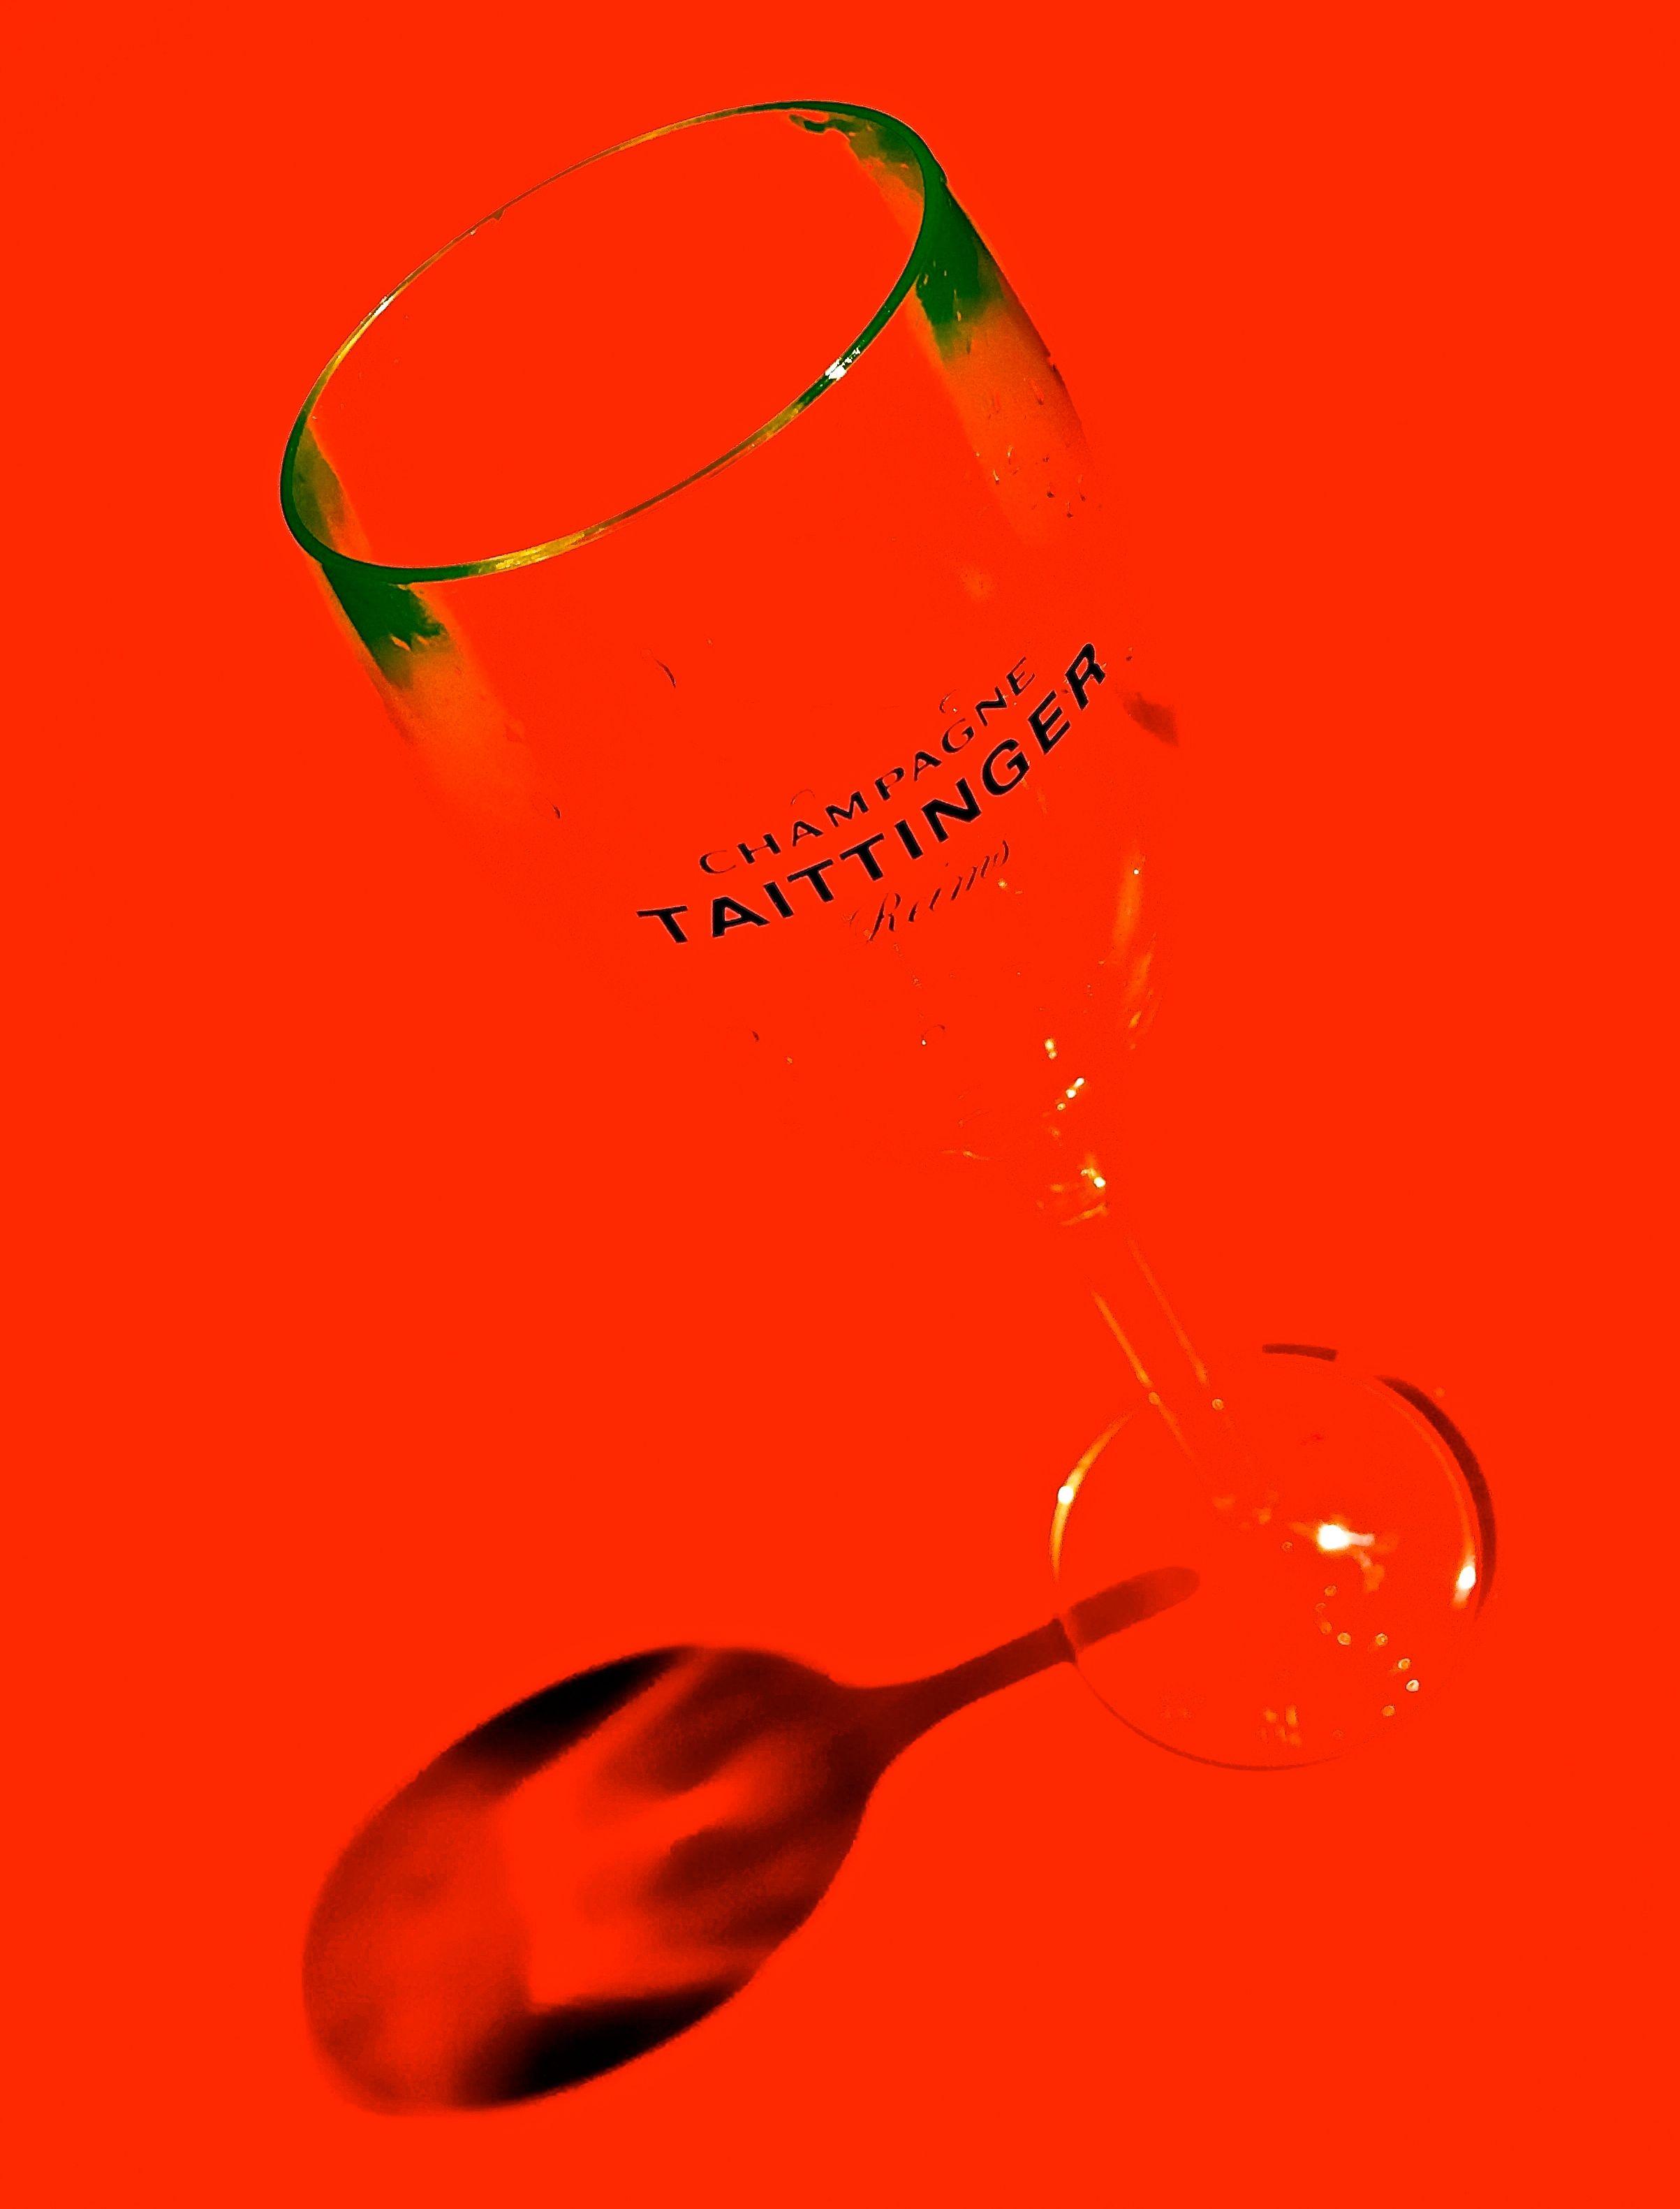 Champagne Taittinger - Fabio & Renata